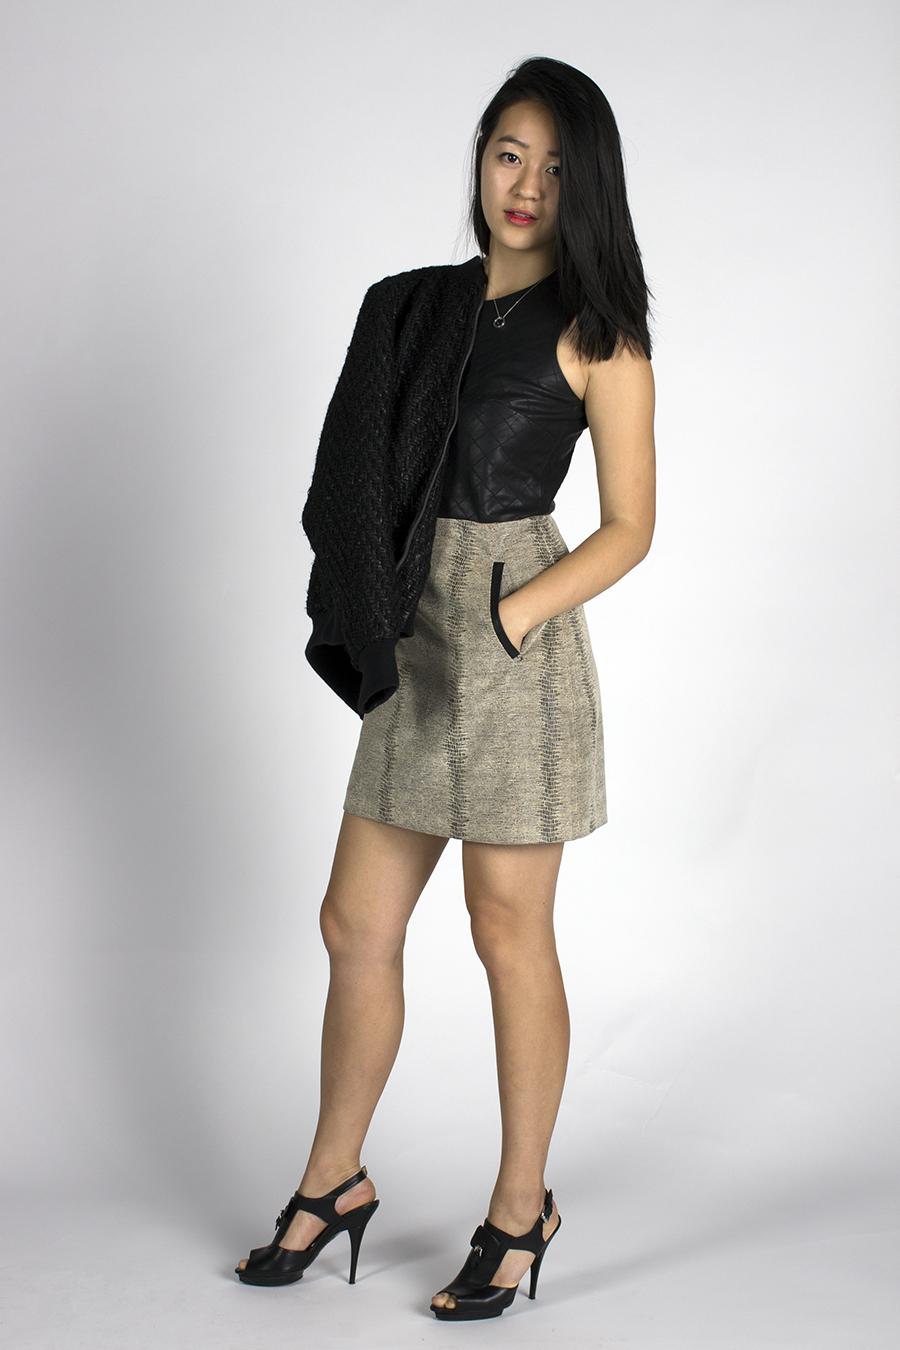 Sharon_Song_fashion_photography_millenial_professional_dres_Tony_Ward_Studio_women_sexy_sleeveless